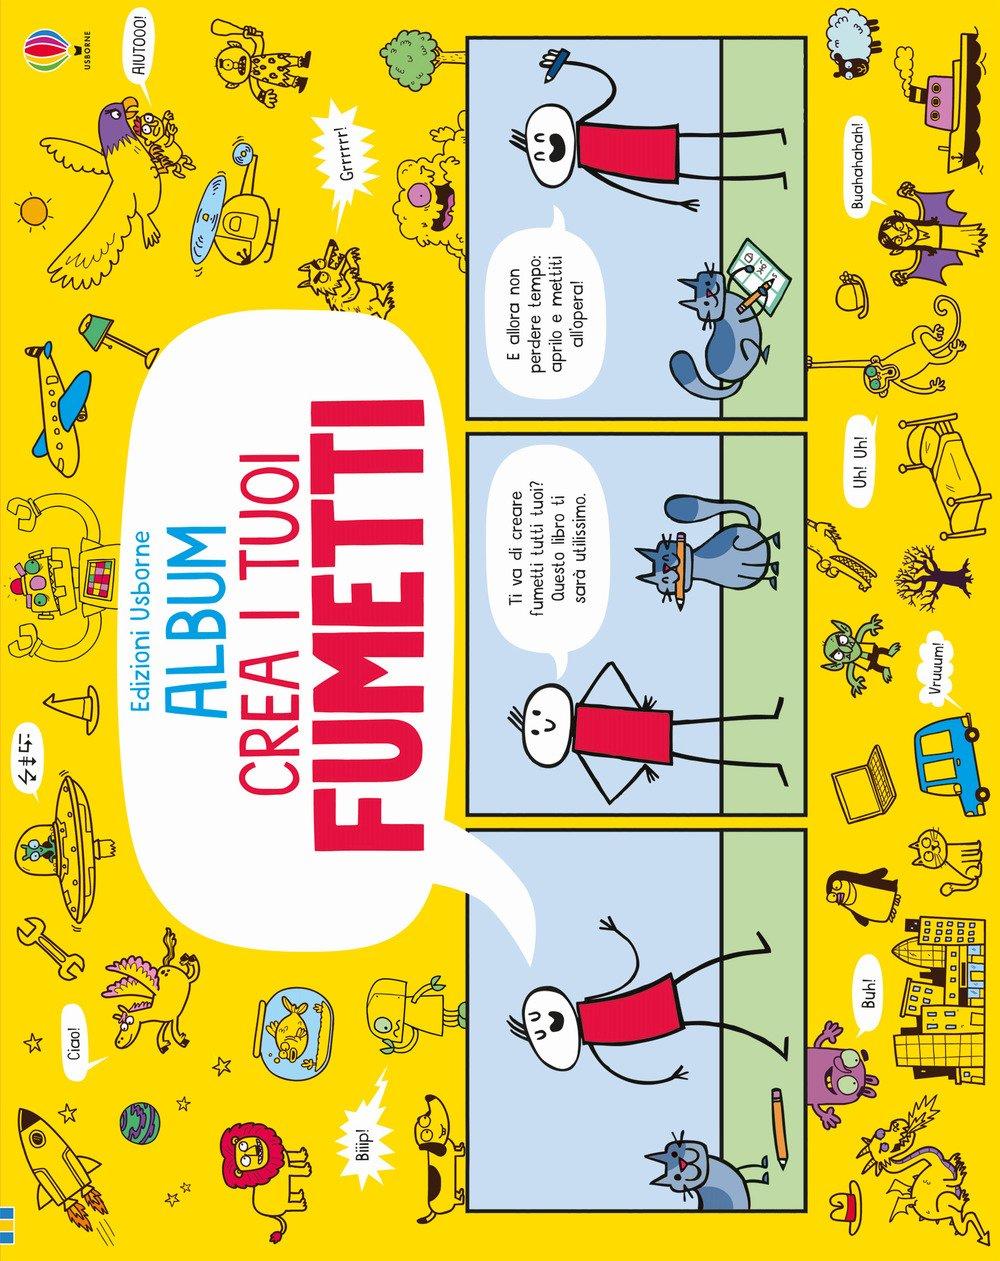 Crea i tuoi fumetti. Album Usborne. Ediz. illustrata Copertina flessibile – 5 ott 2017 Louie Stowell P. A. Livorati Usborne Publishing 1474934781